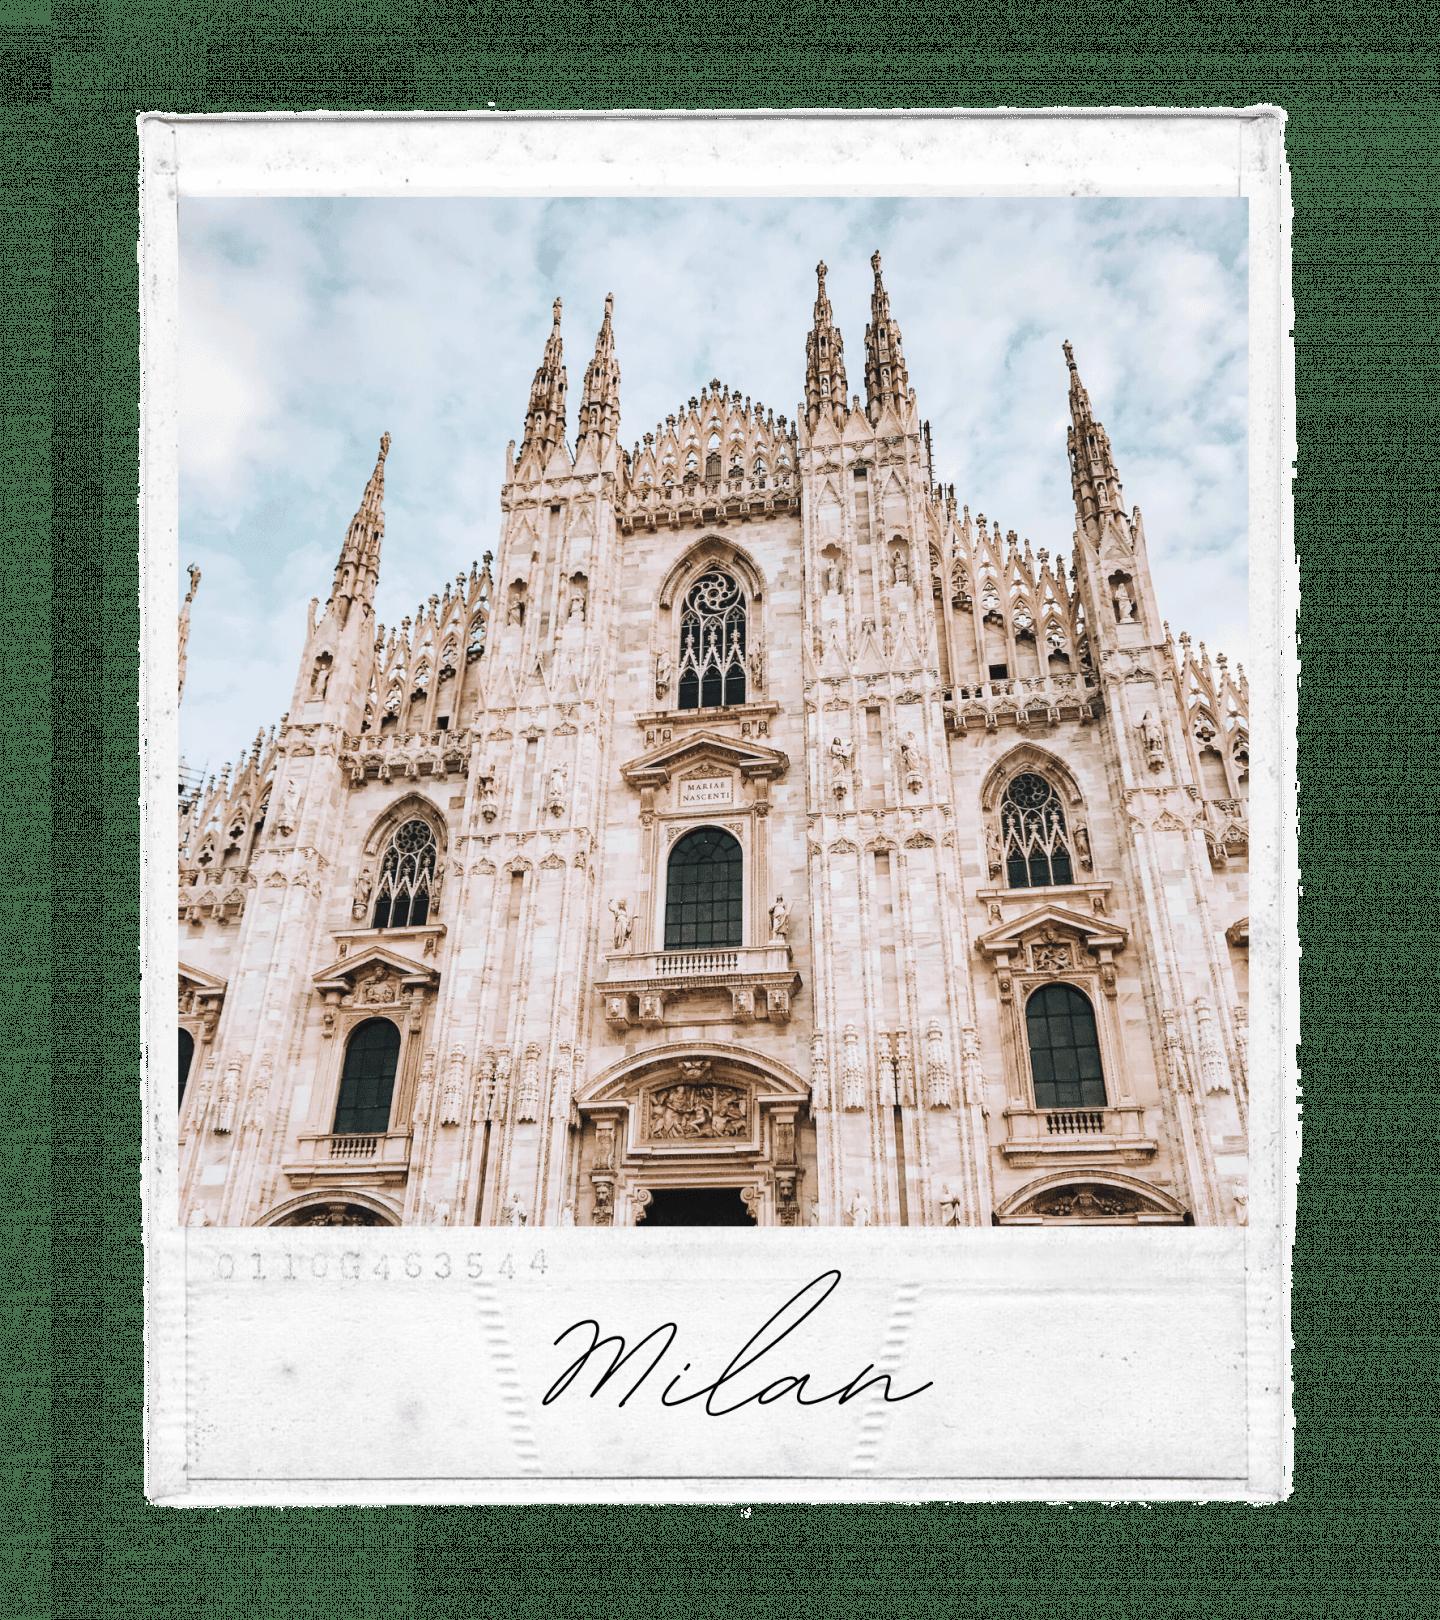 24 Hours in Milan